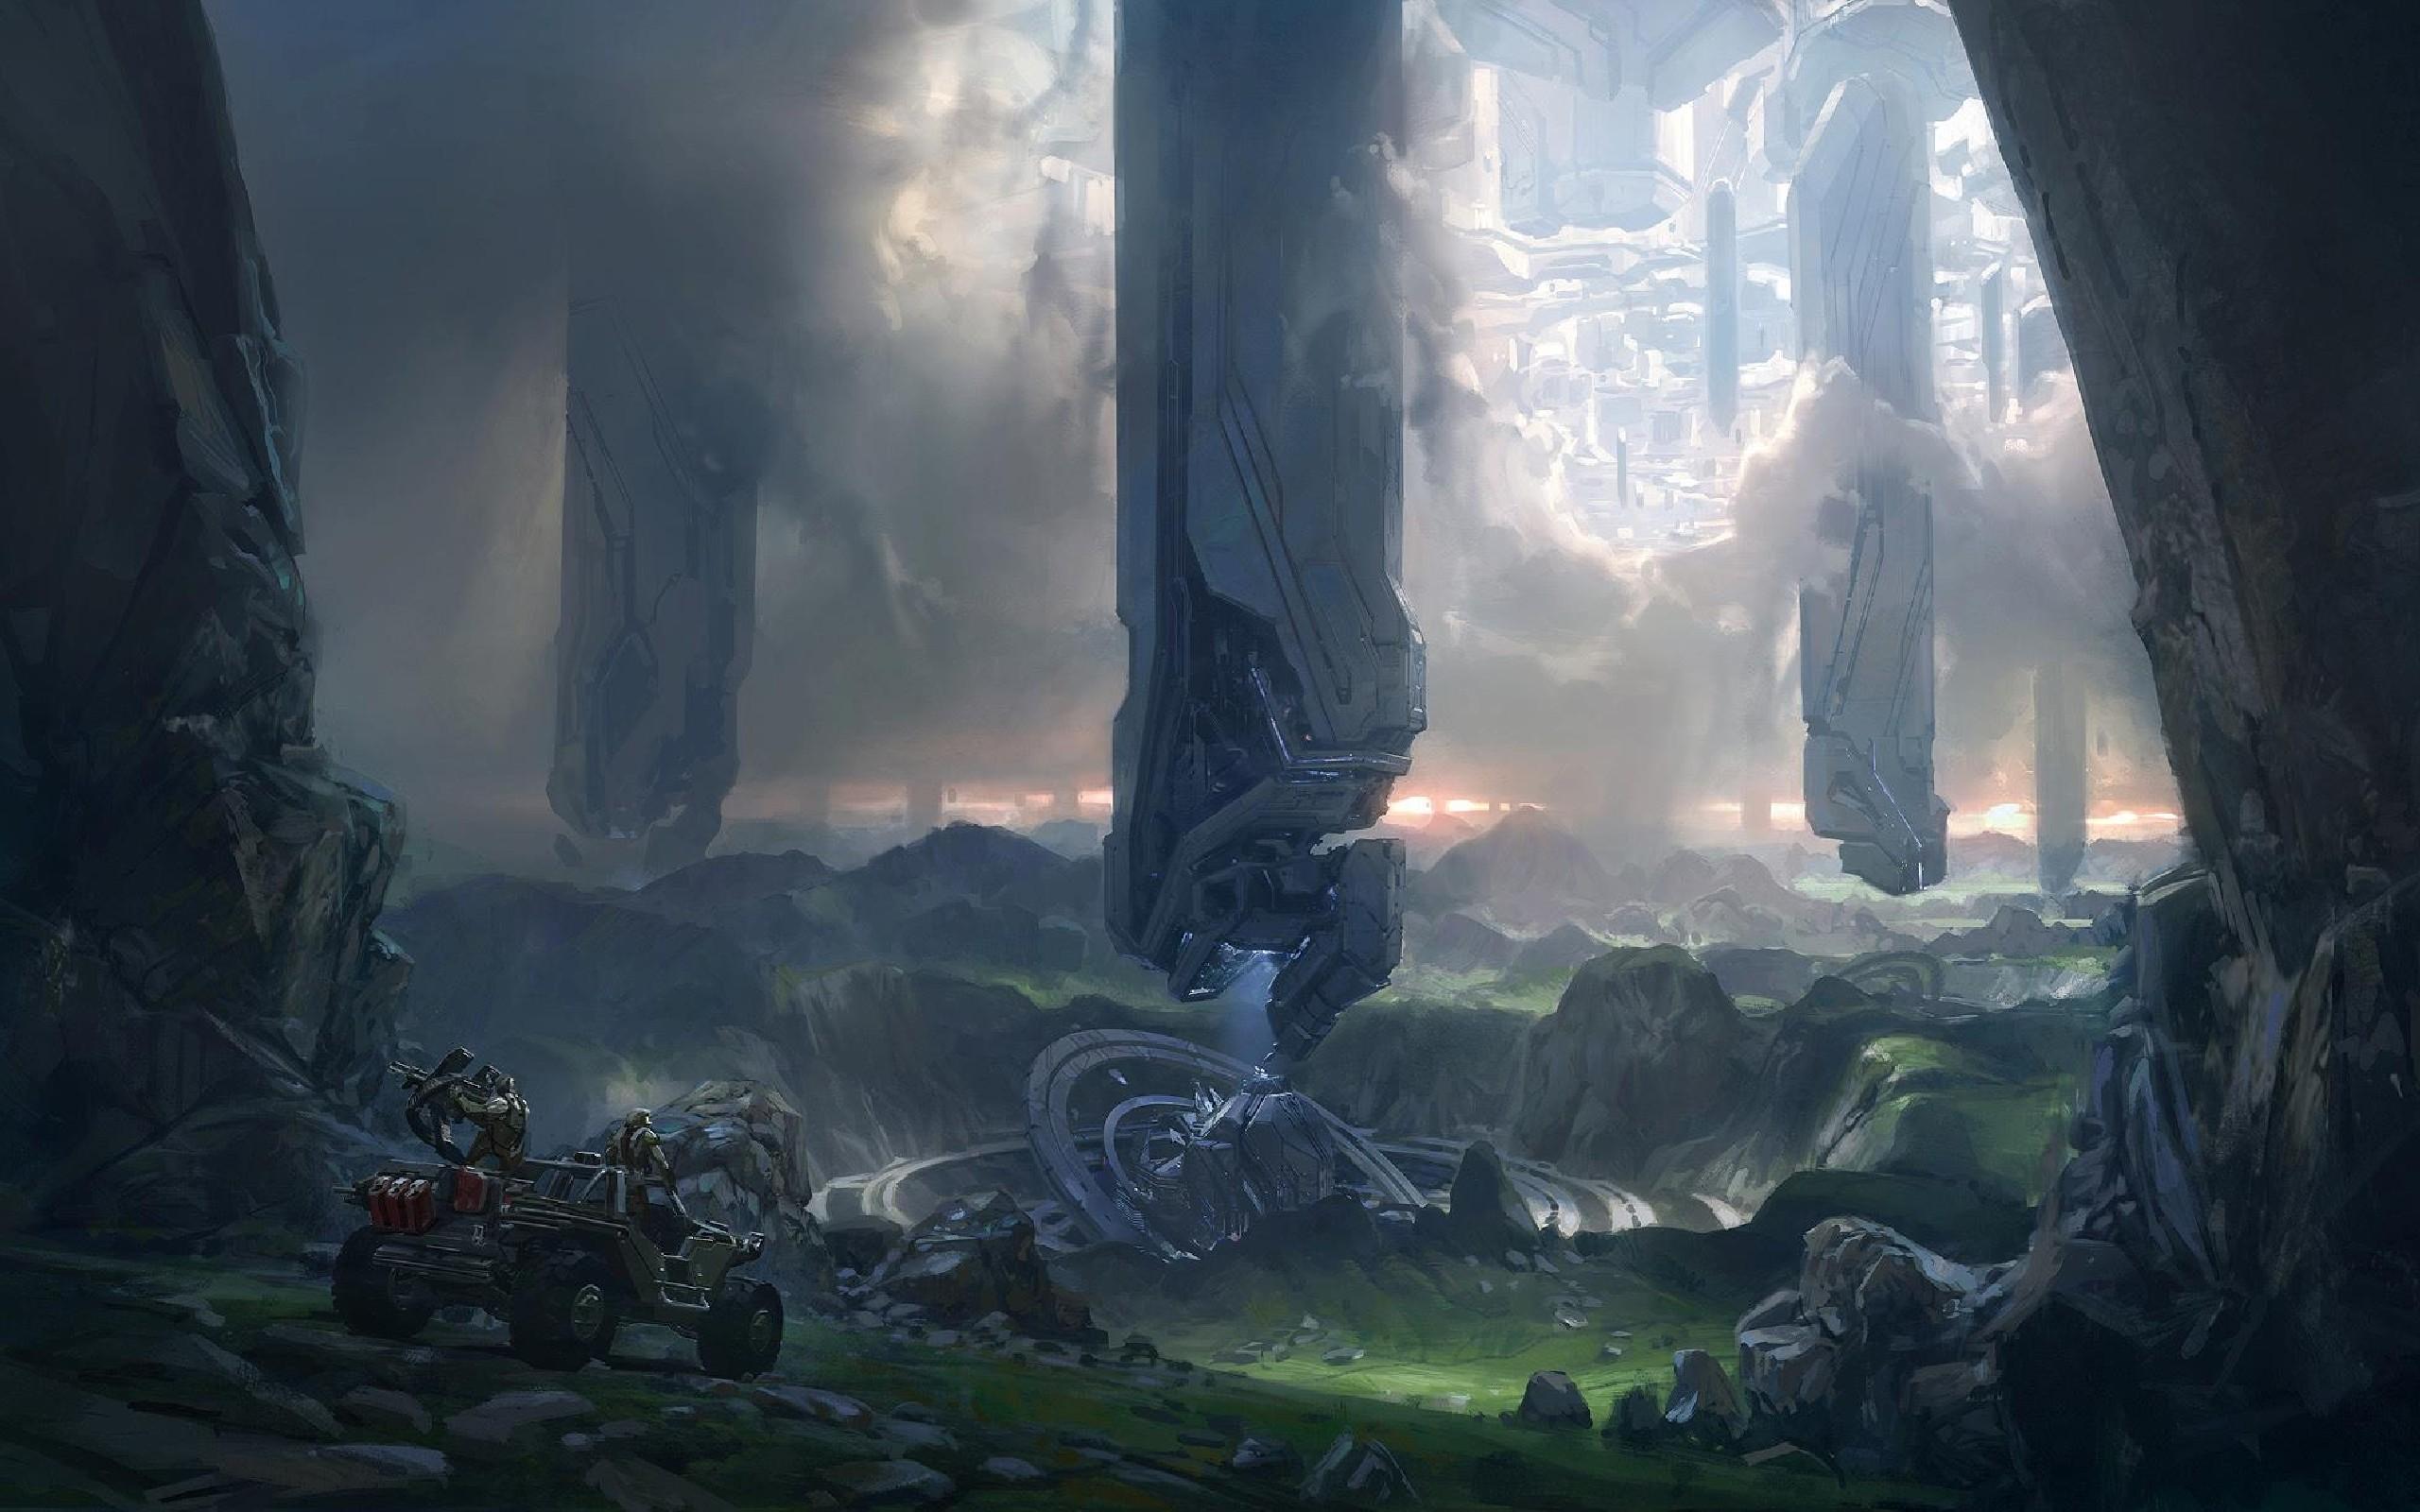 Halo 4 Computer Wallpapers, Desktop Backgrounds | | ID .